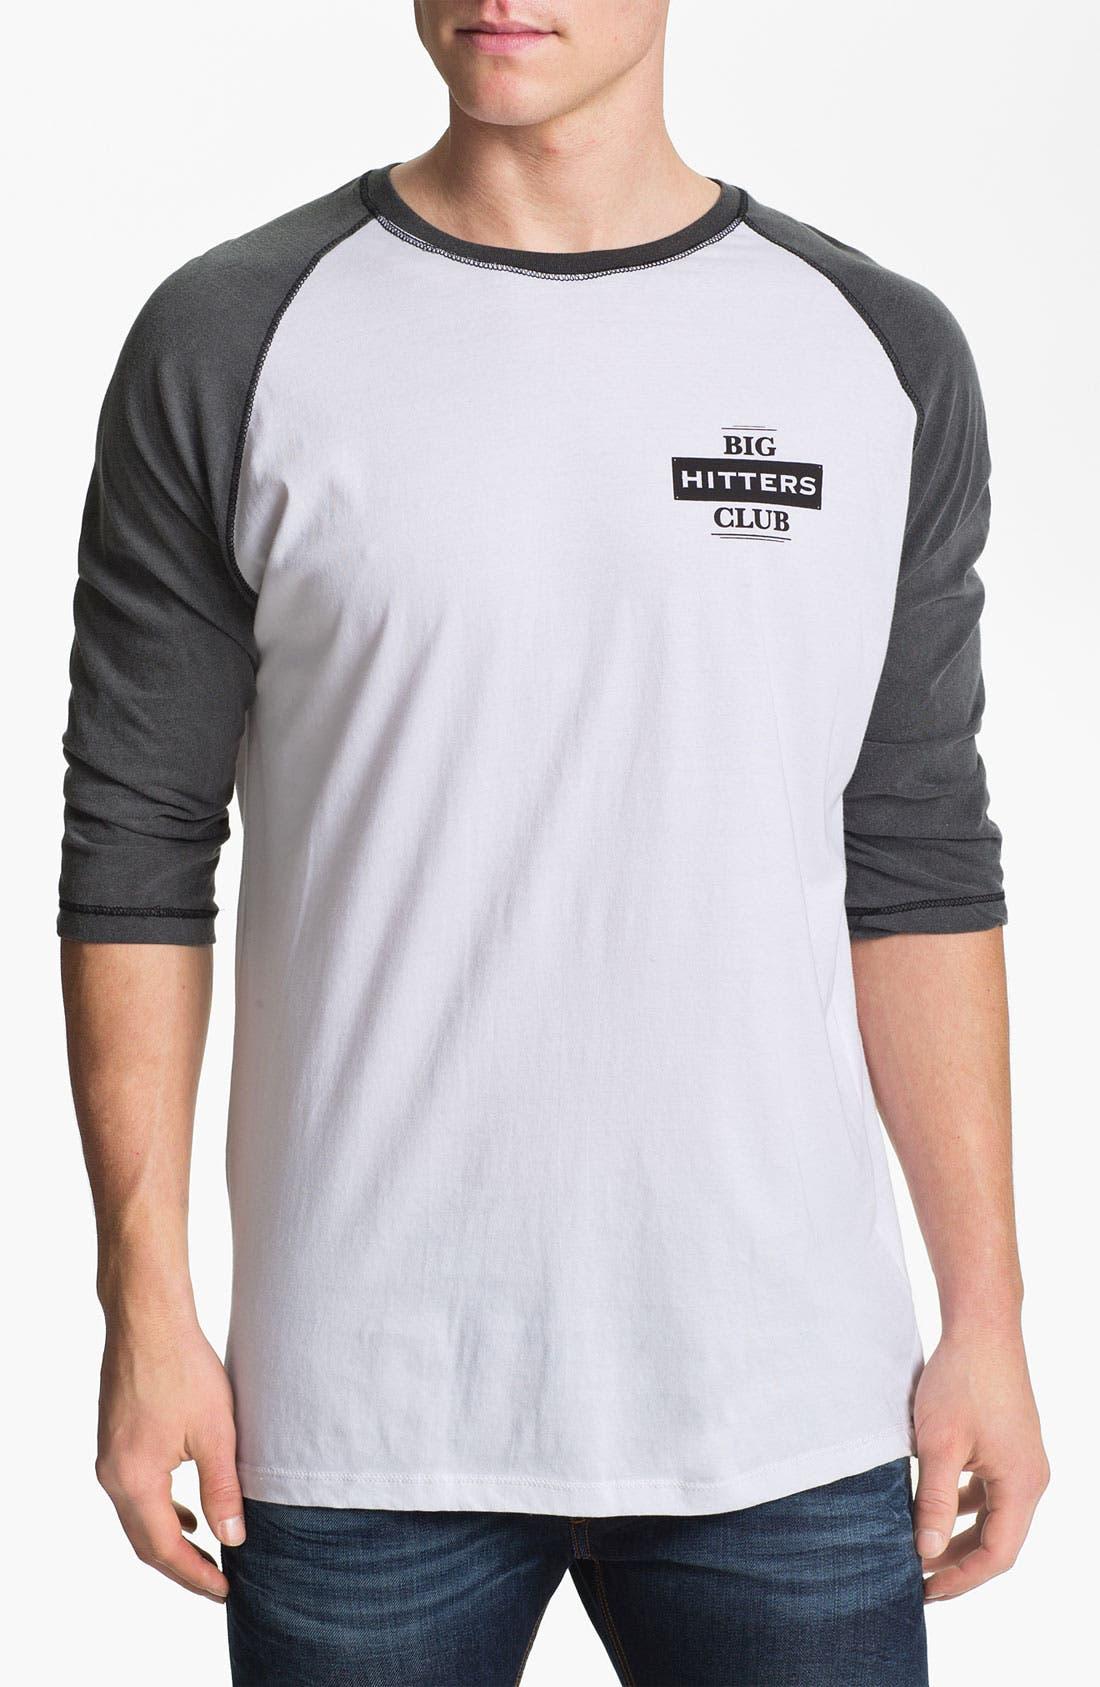 Main Image - Vanguard 'Big Hitters Club' Graphic Baseball T-Shirt